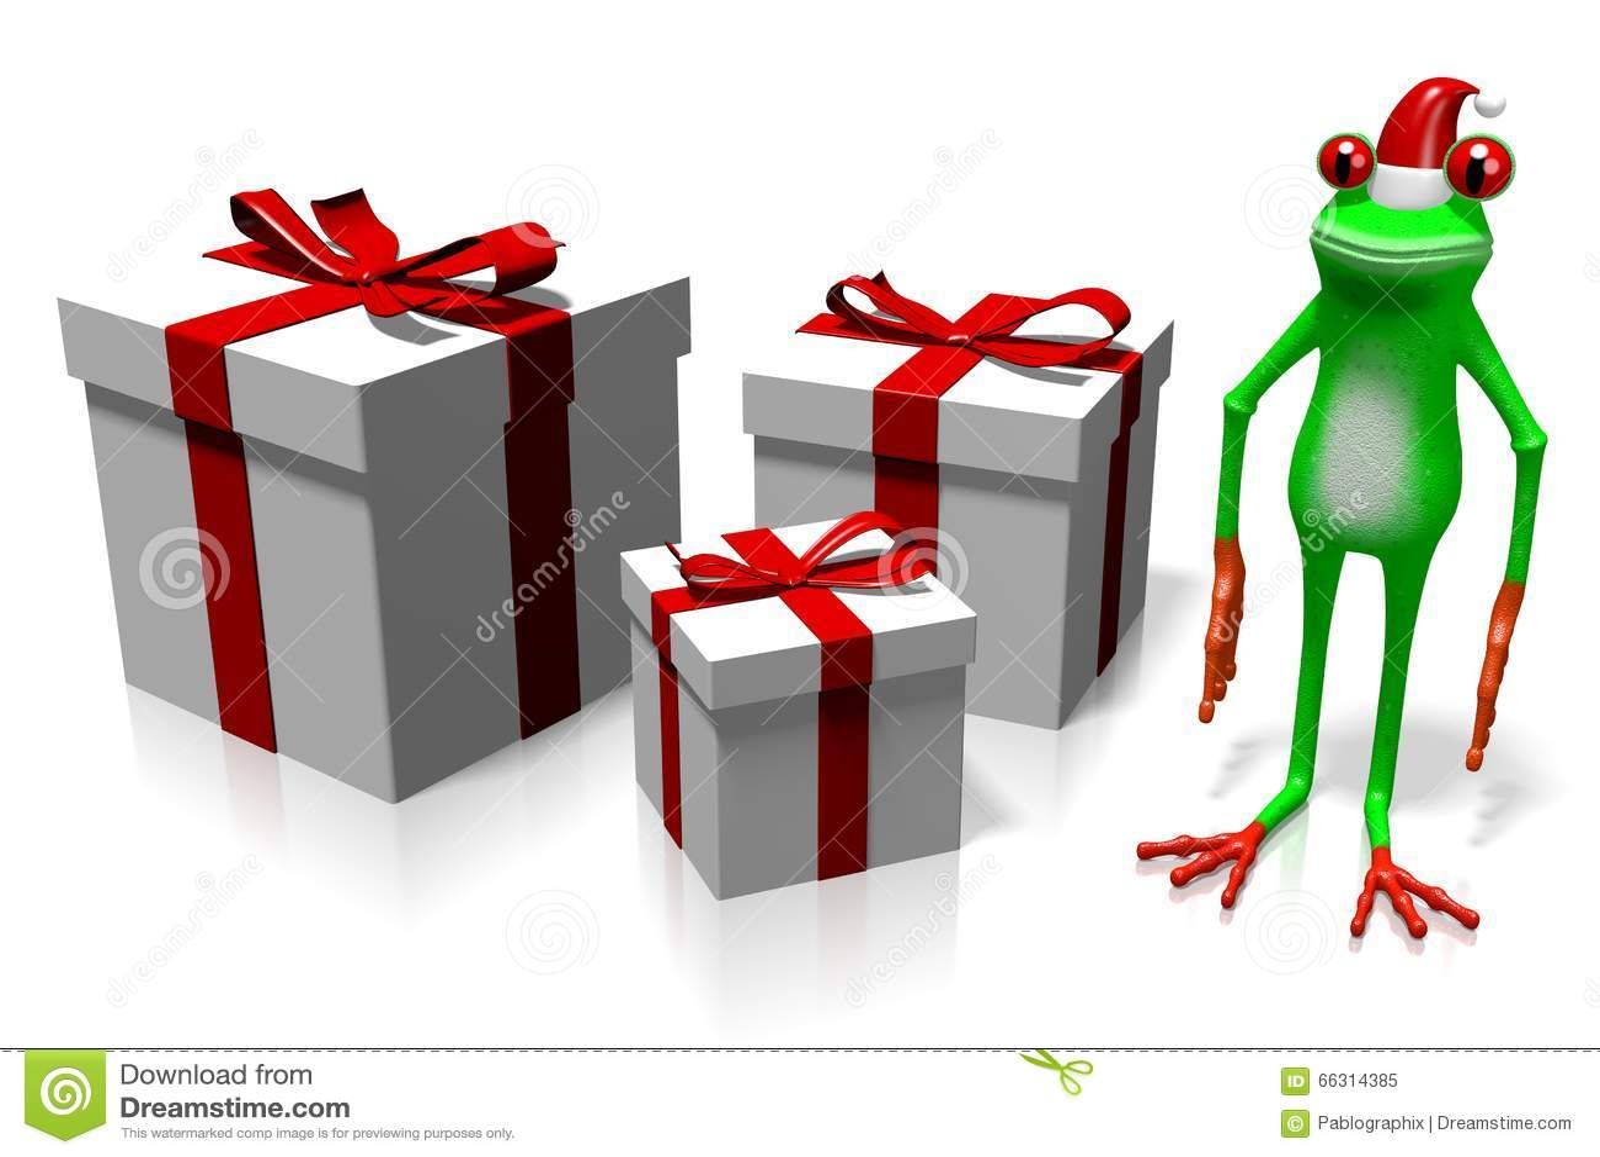 D cartoon frog christmas card stock illustration